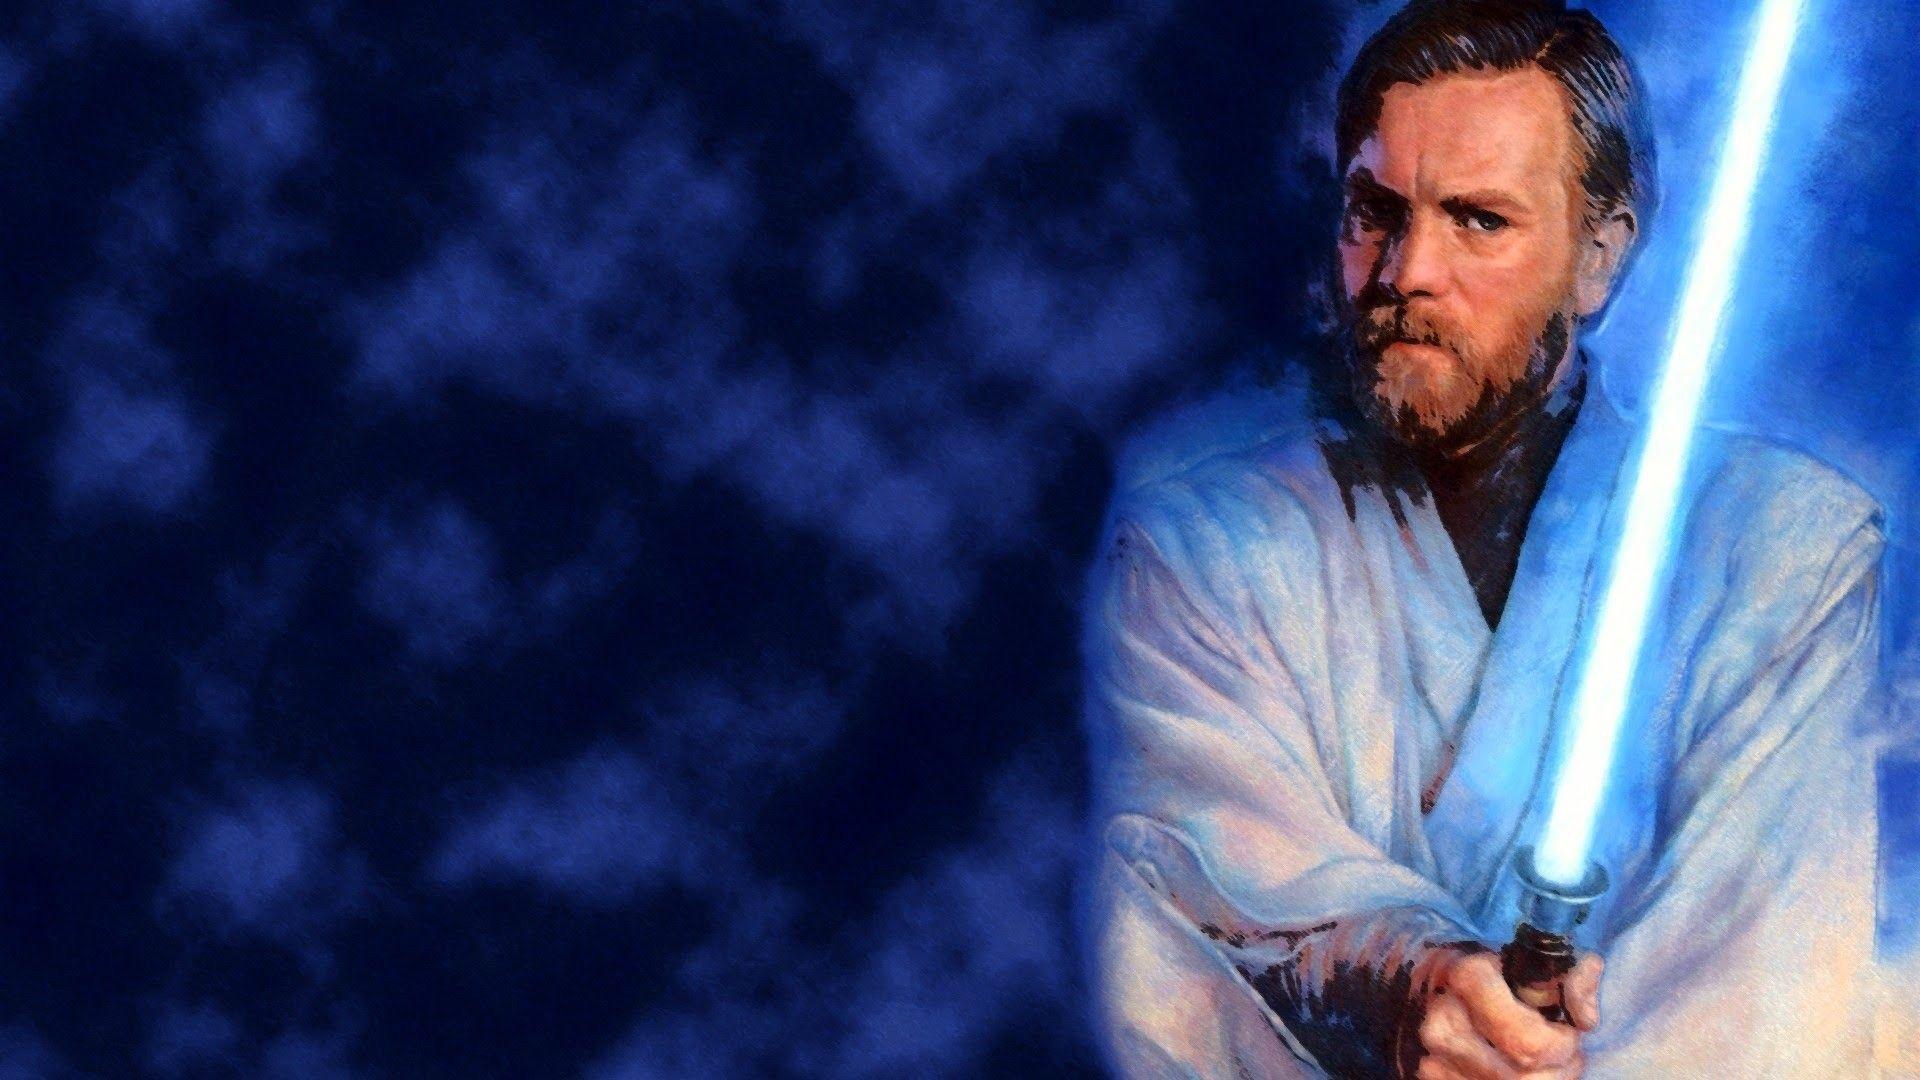 Obi Wan Ben Kenobi Wallpaper Star Wars Wallpaper Obi Wan Kenobi Wallpaper Star Wars